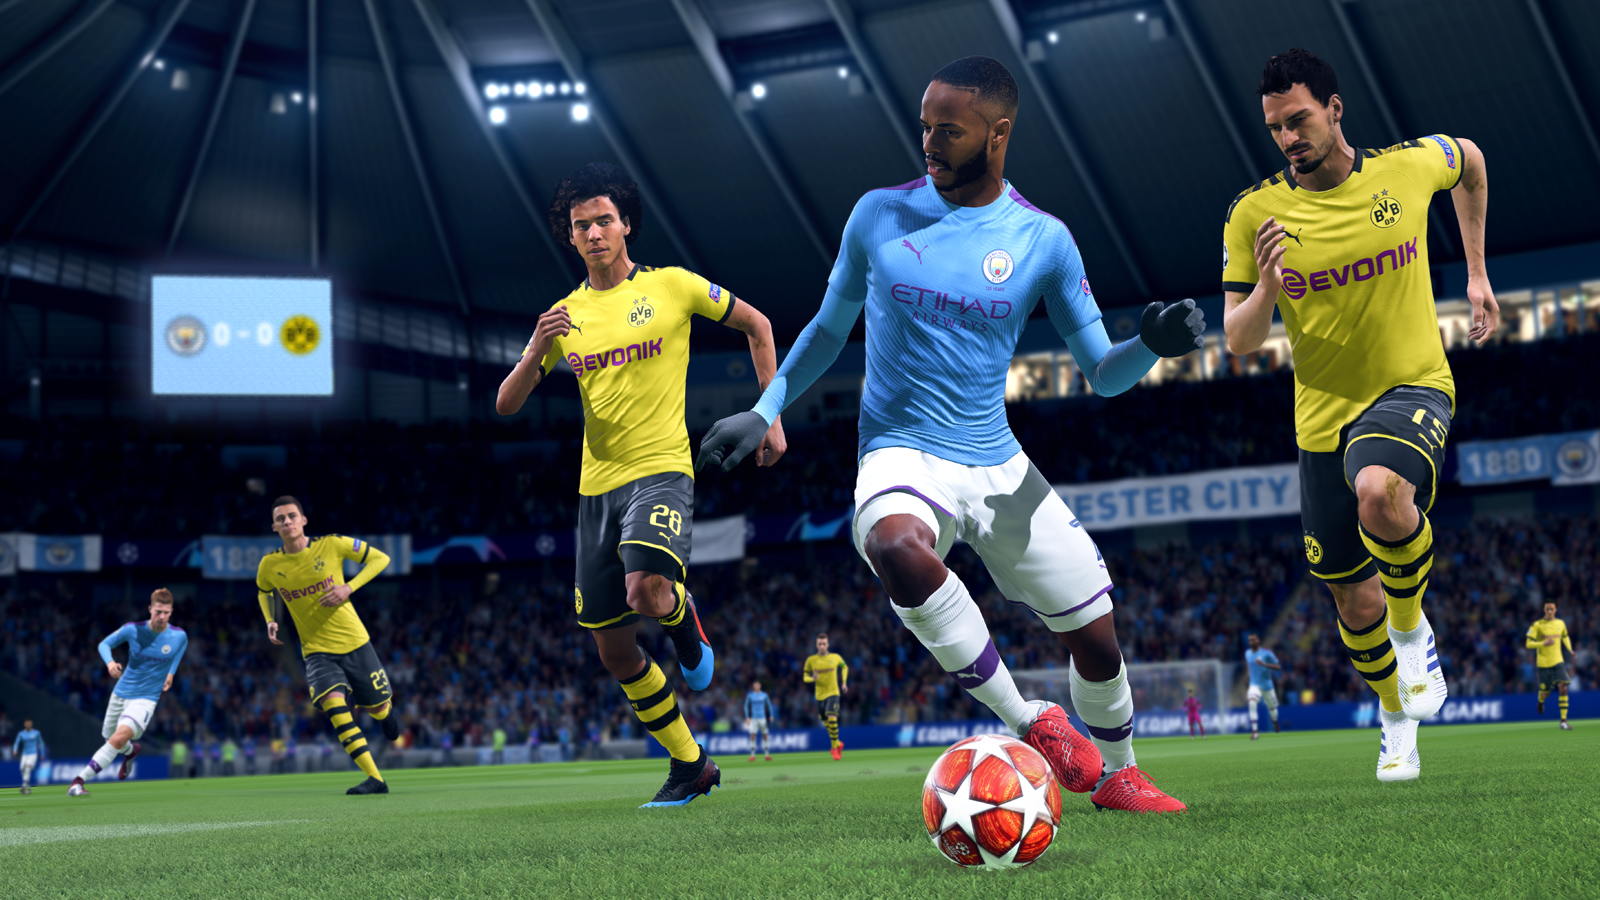 Play Soccer Online